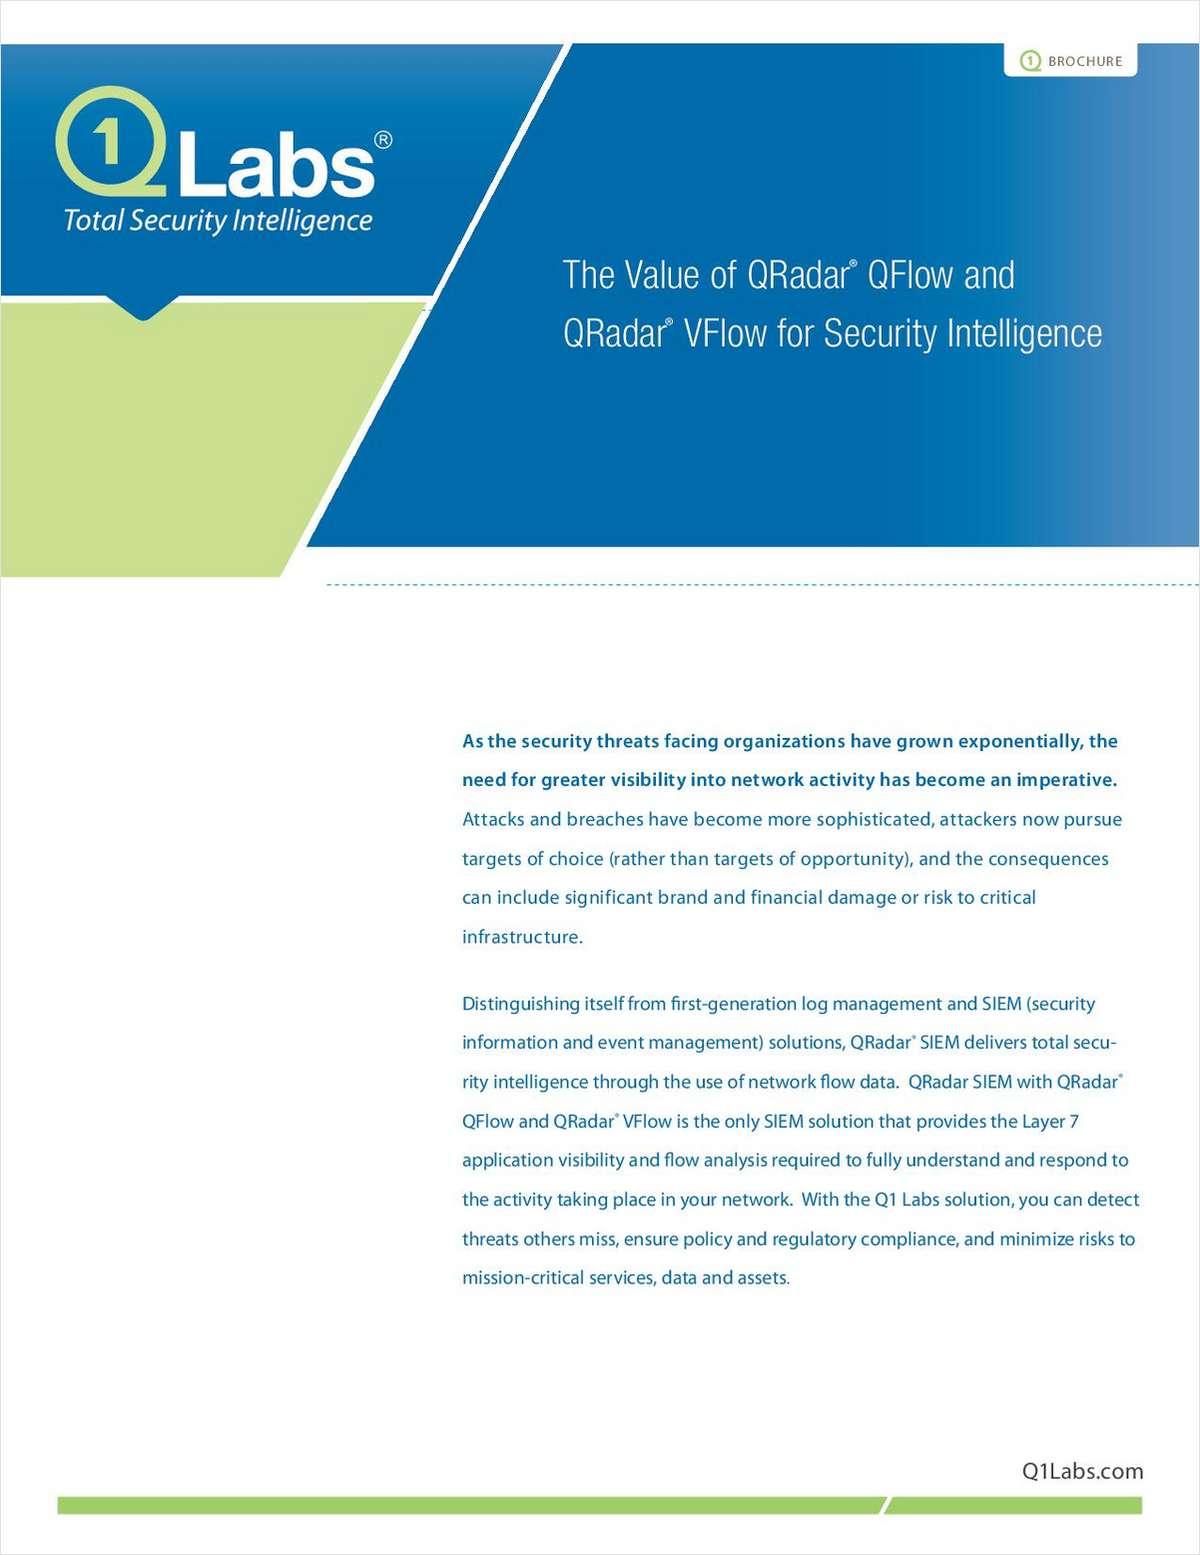 The Value of QRadar® QFlow and QRadar® VFlow for Security Intelligence